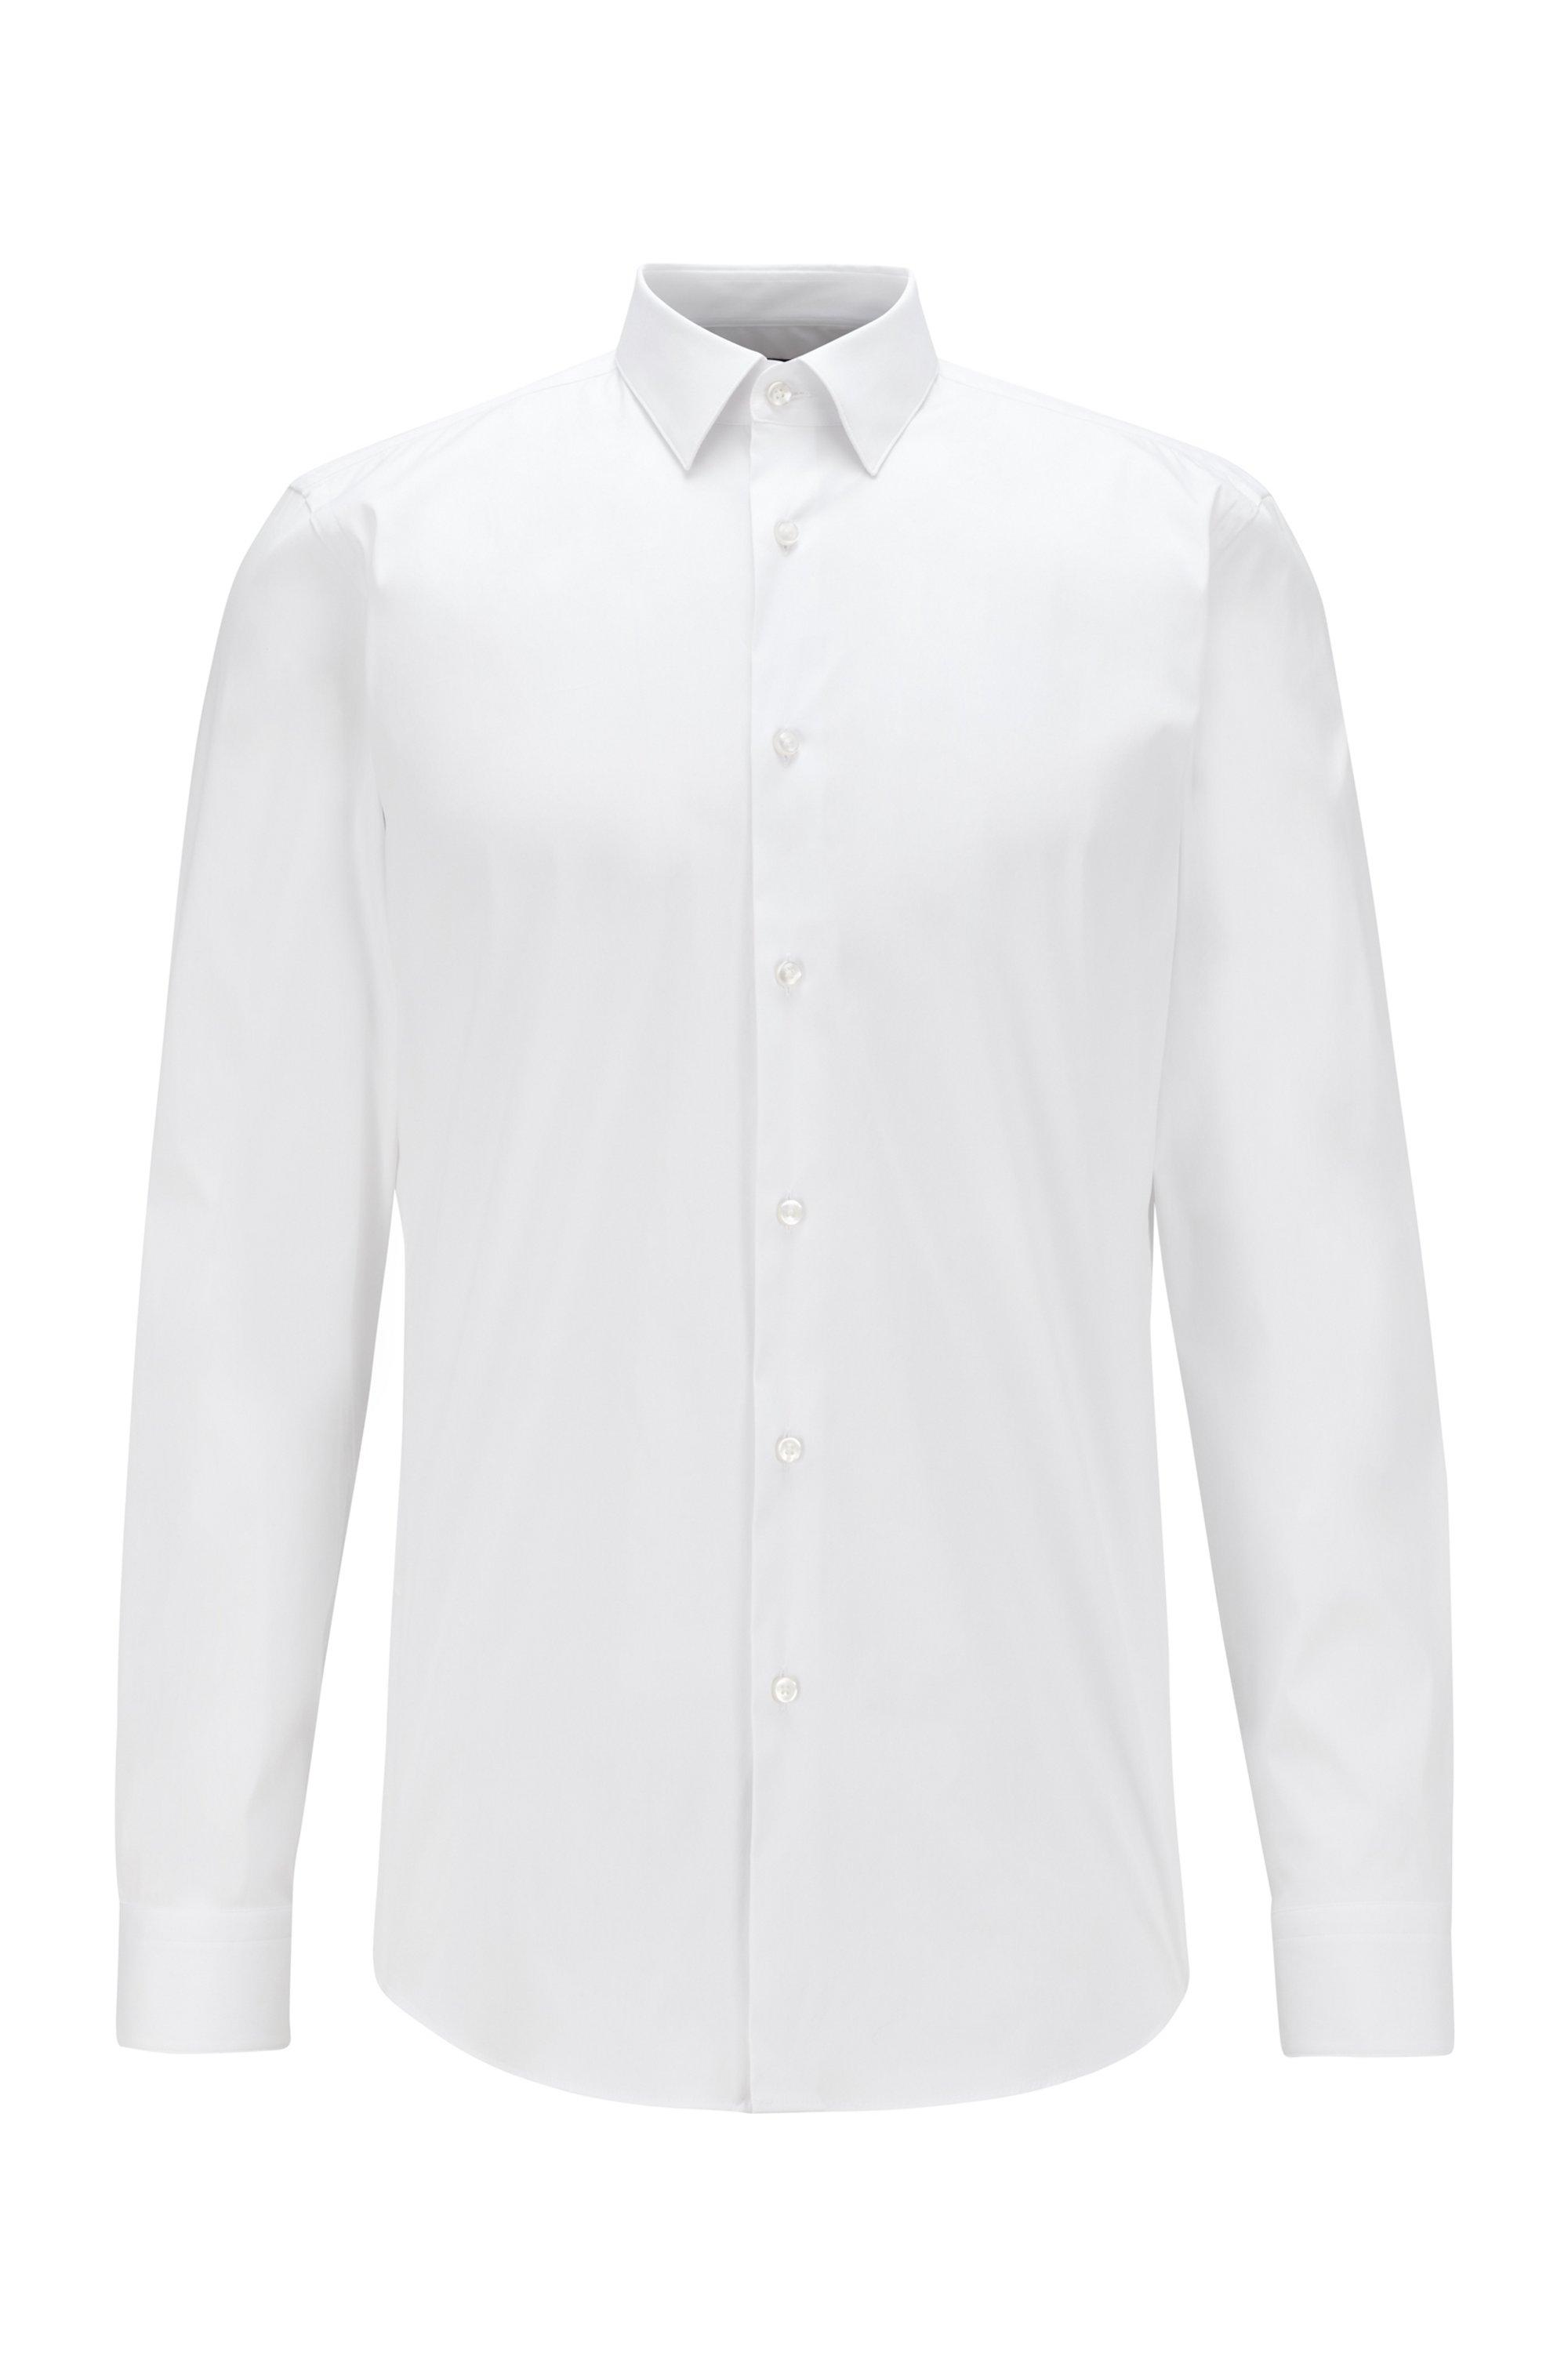 Slim-fit shirt in cotton-blend stretch poplin, White